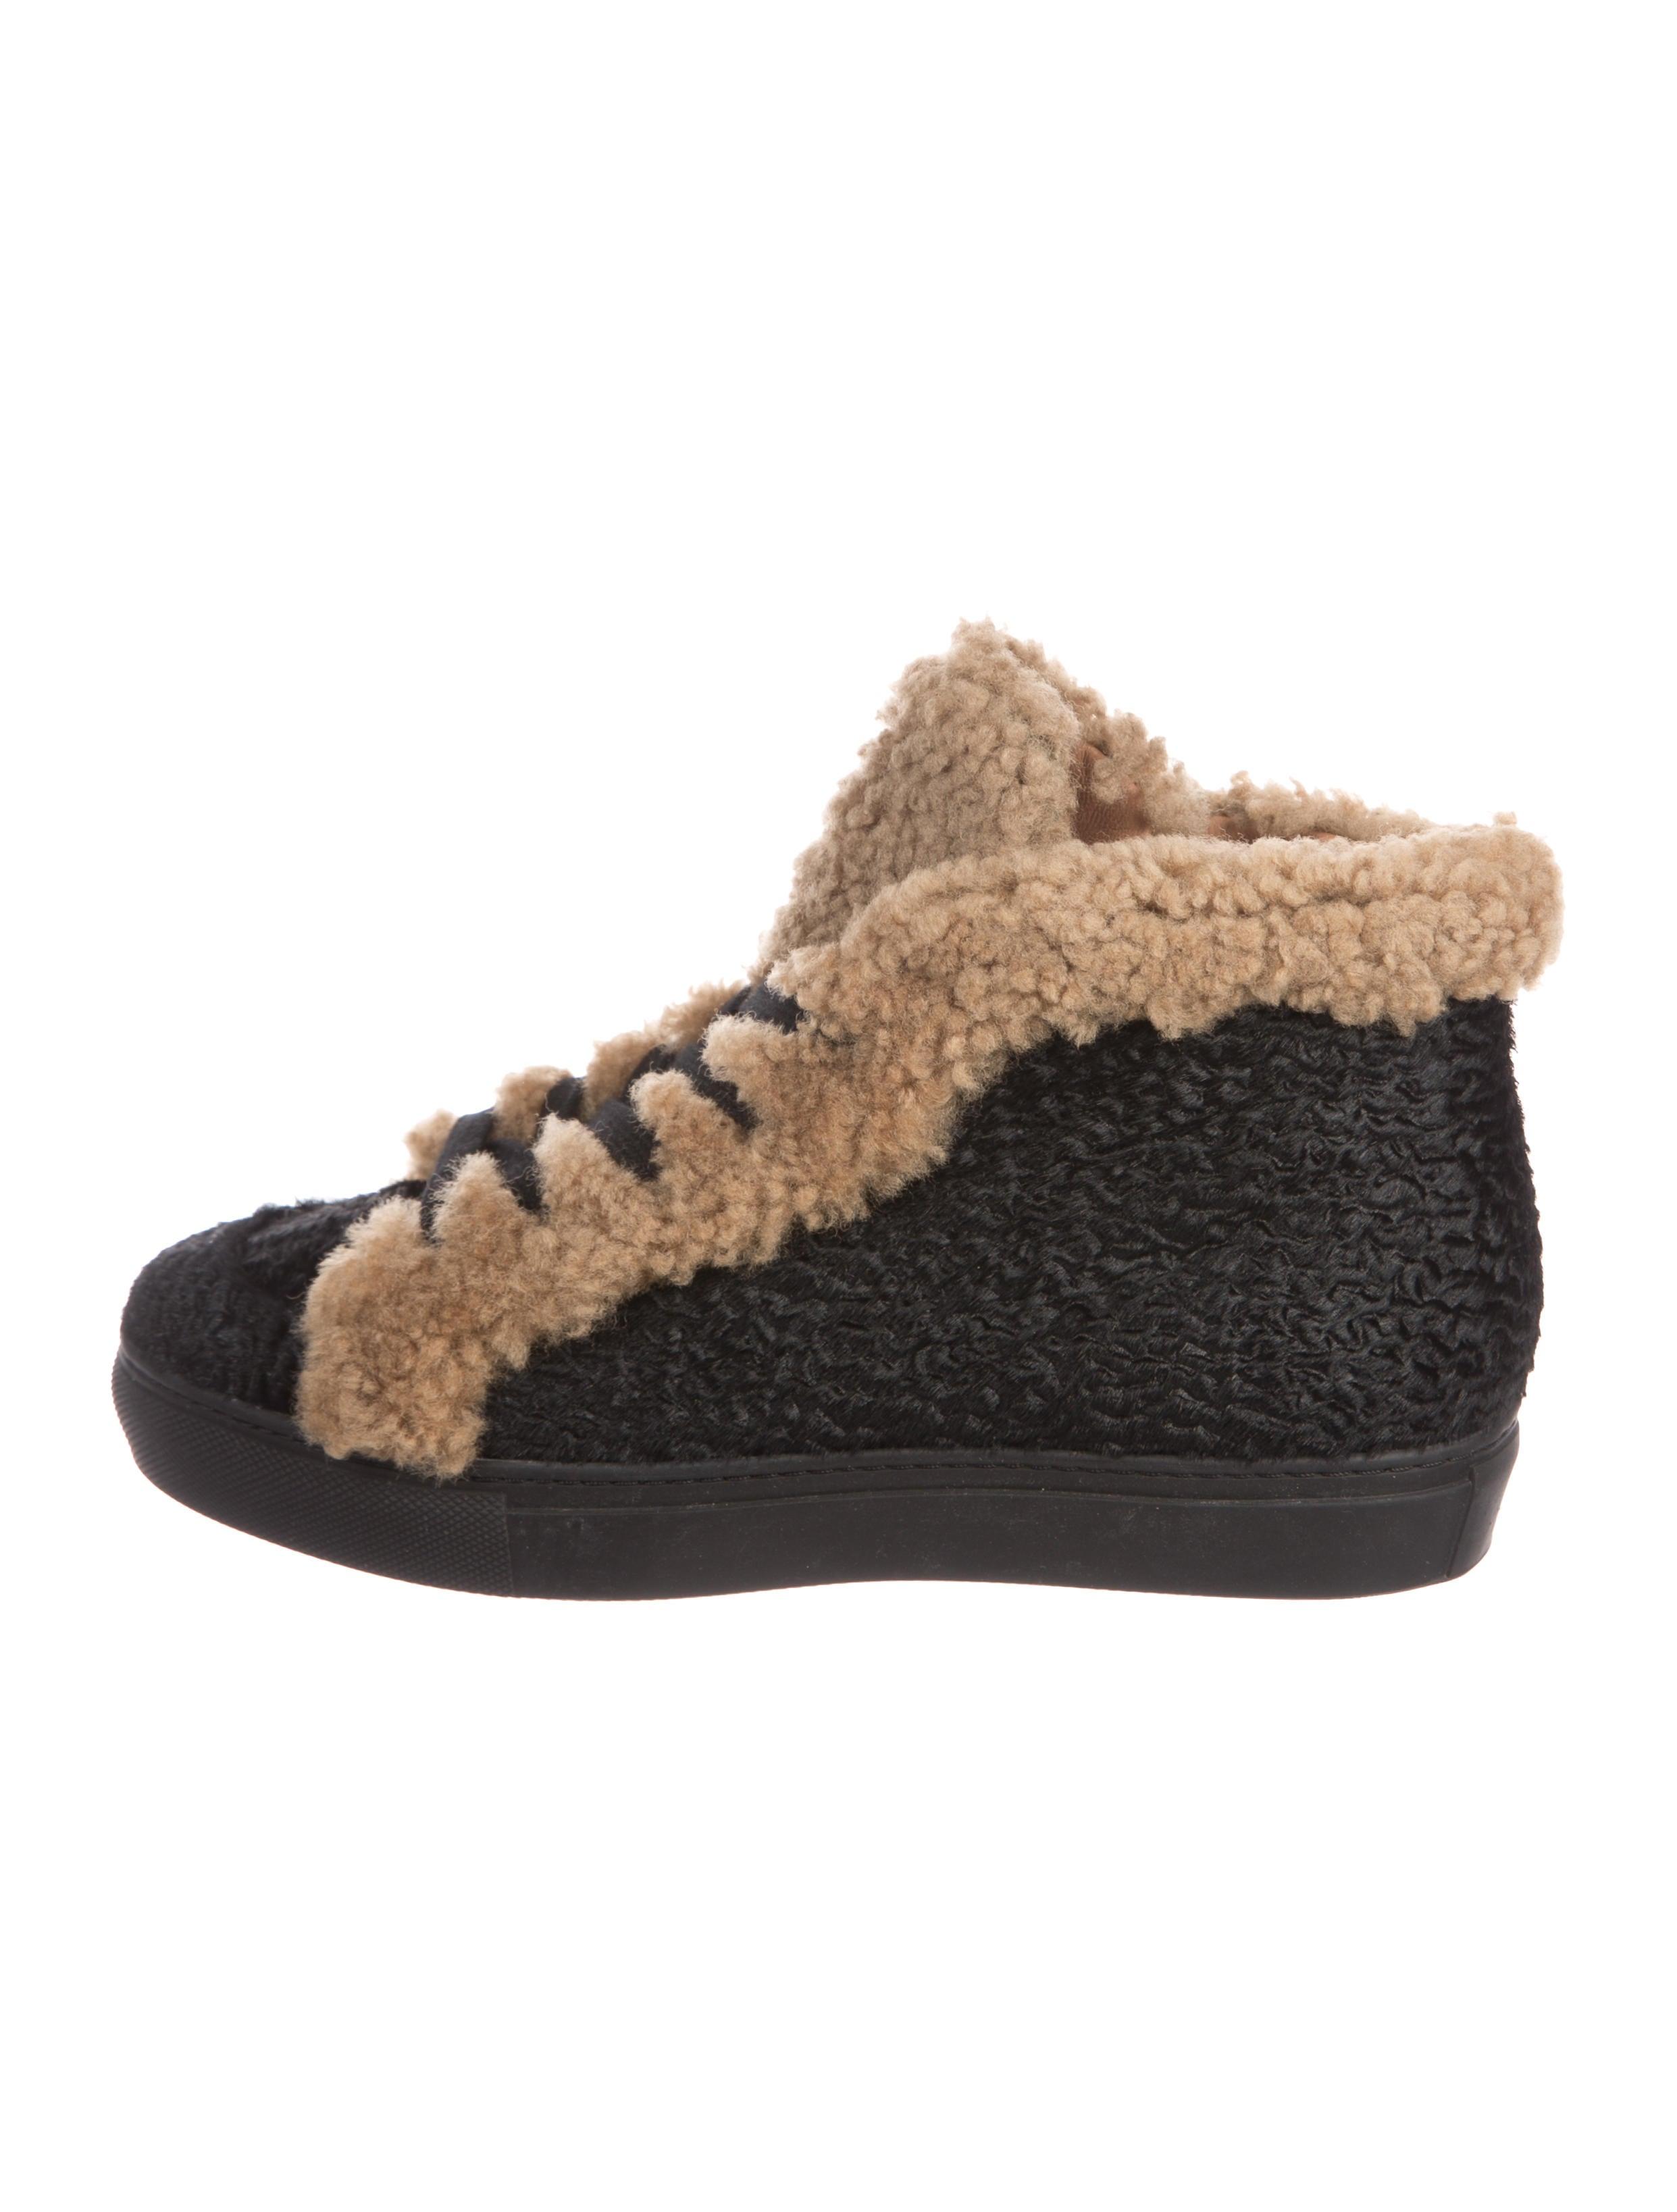 Laurence Dacade Hugh Ponyhair High-Top Sneakers outlet footlocker wide range of cheap price TSKmfgT5